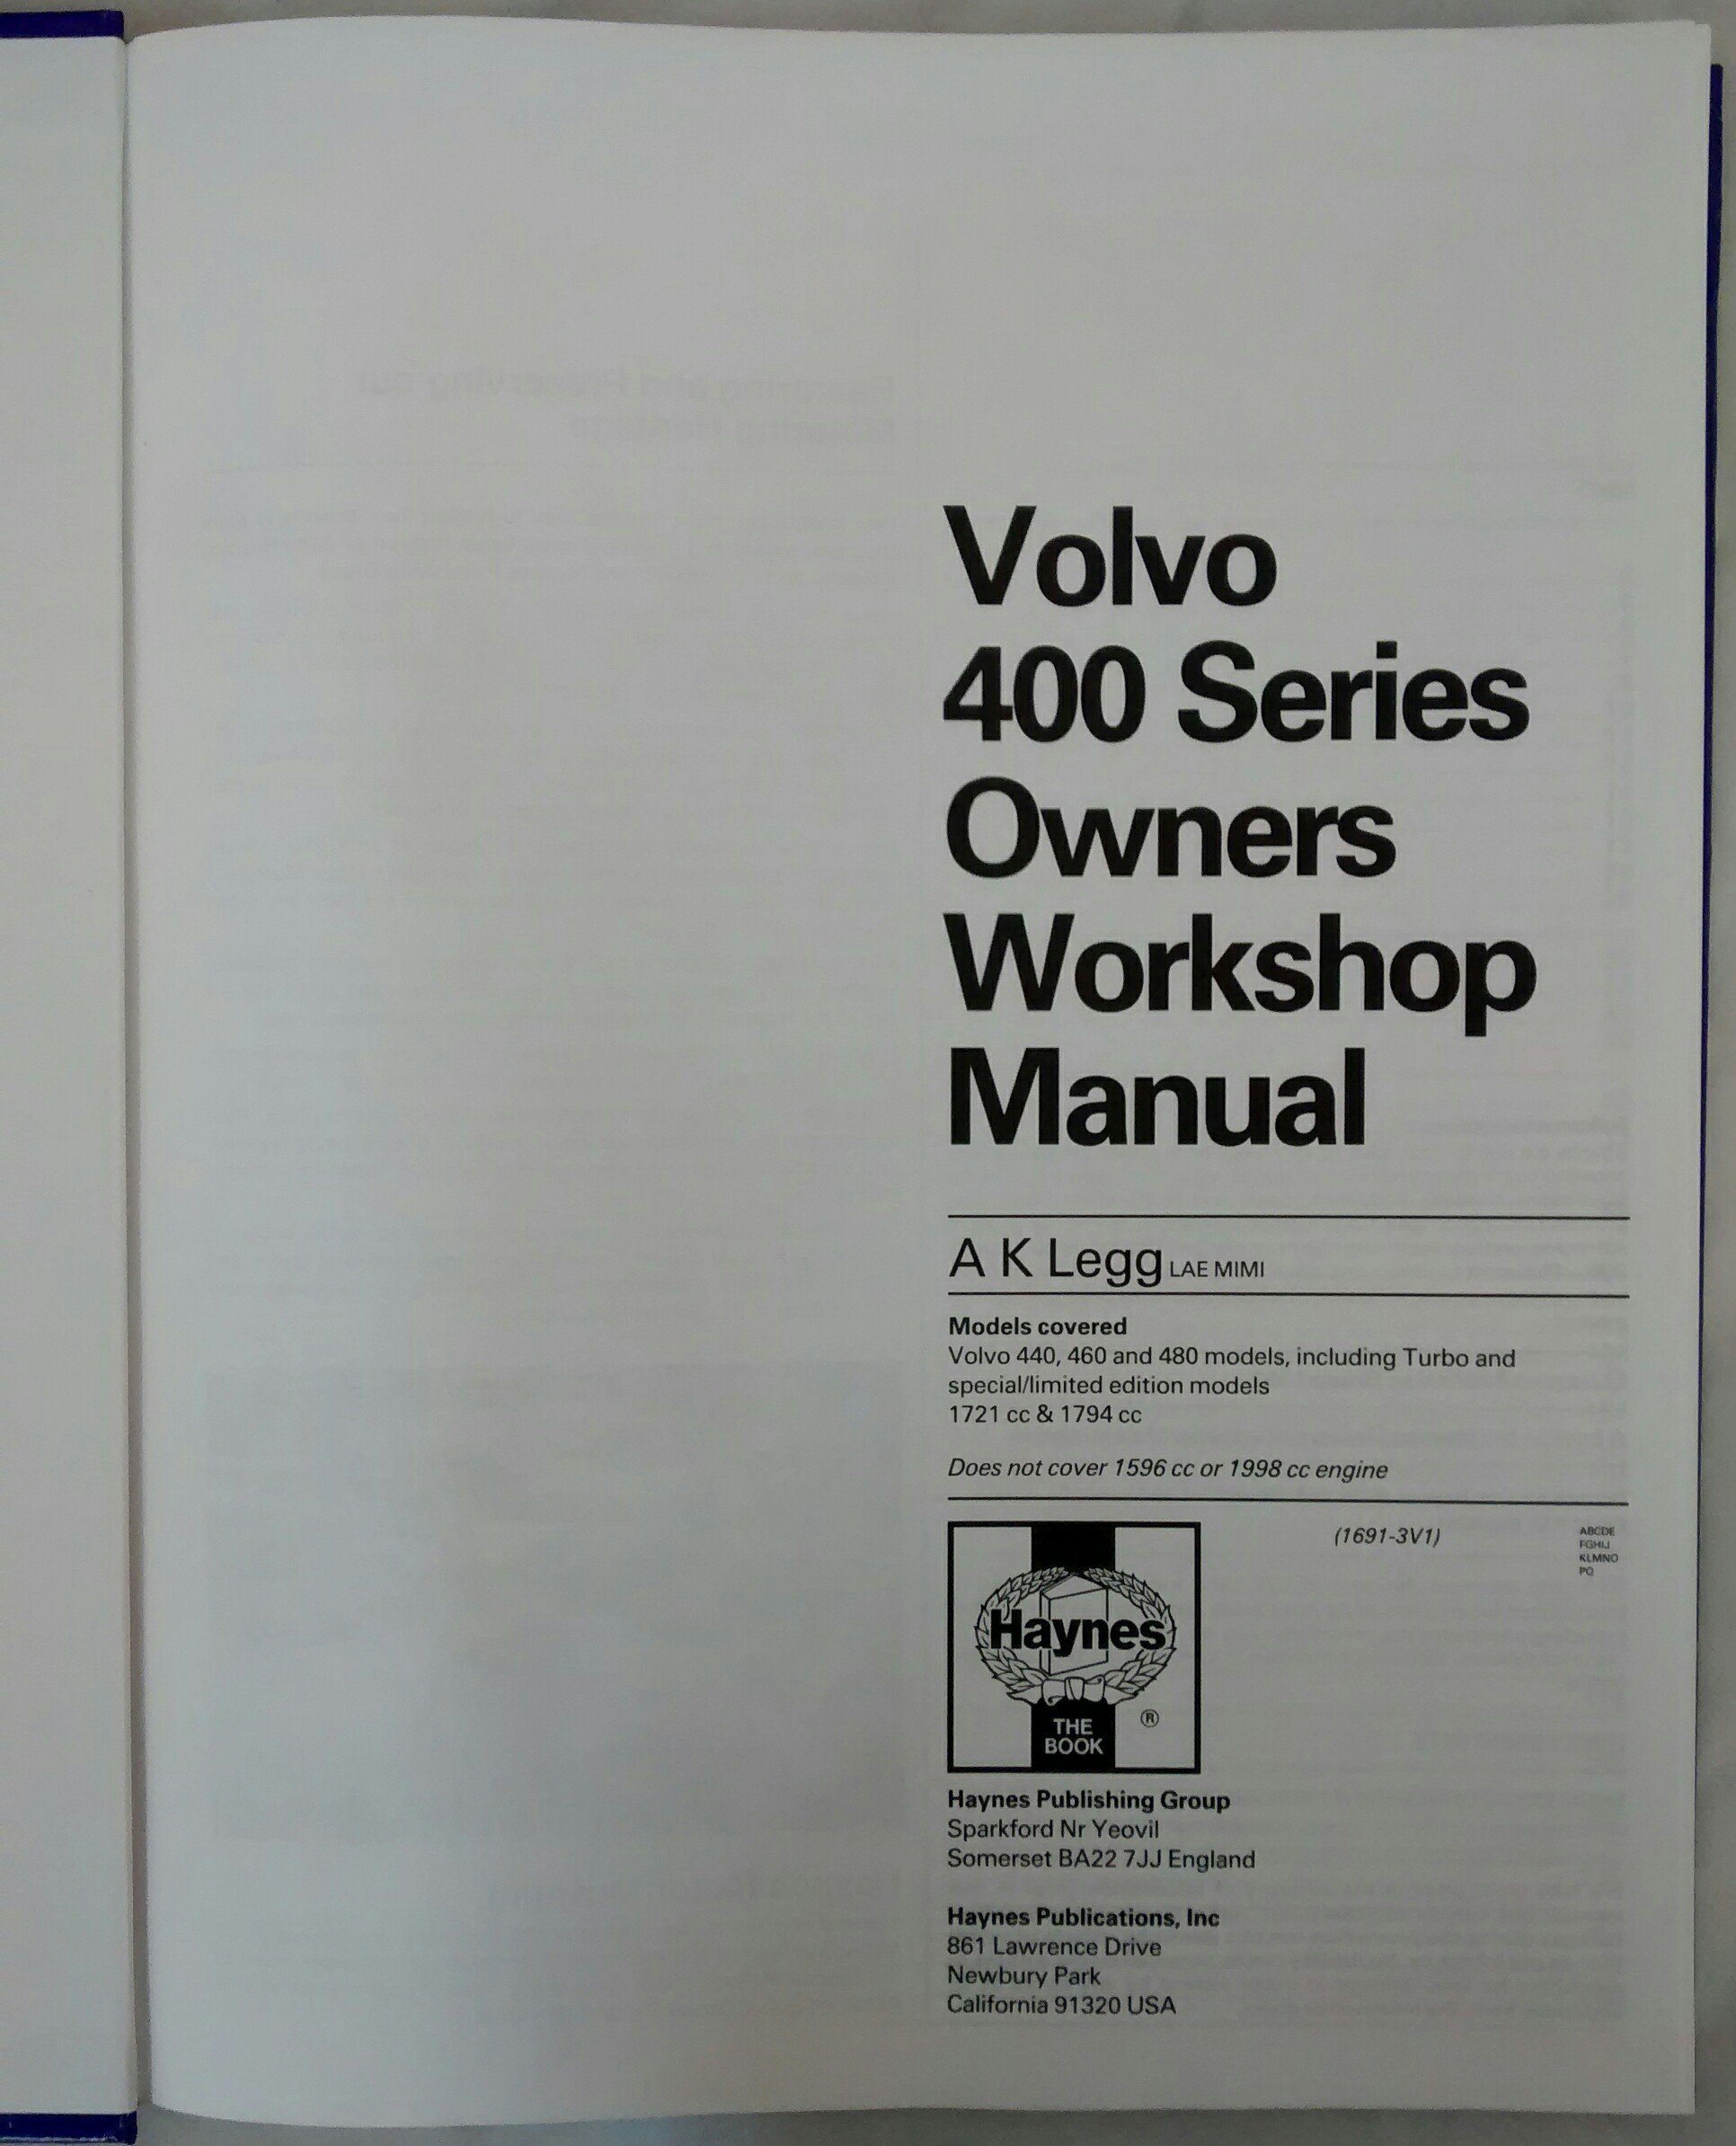 Volvo 440, 460 and 480 Owners Workshop Manual Service & repair manuals: Amazon.es: A. K. Legg: Libros en idiomas extranjeros